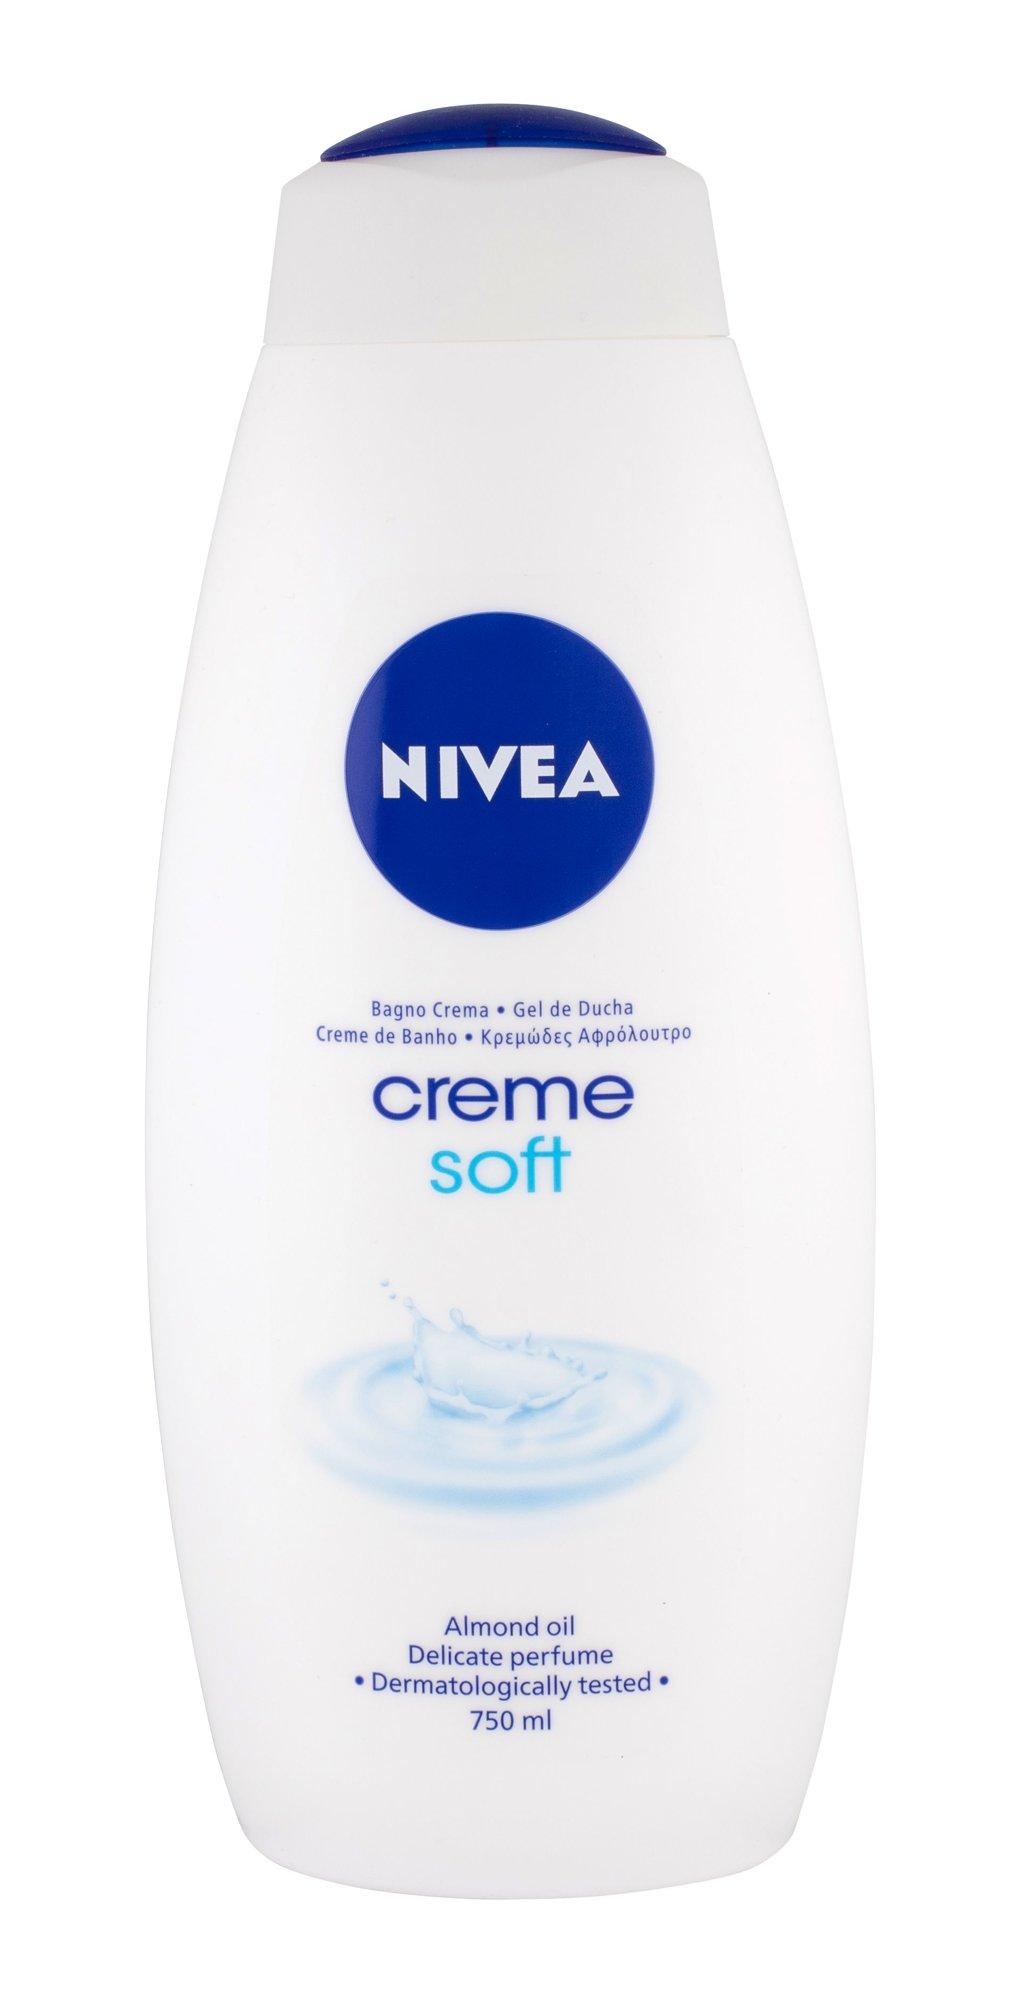 Nivea Creme Soft Cosmetic 750ml